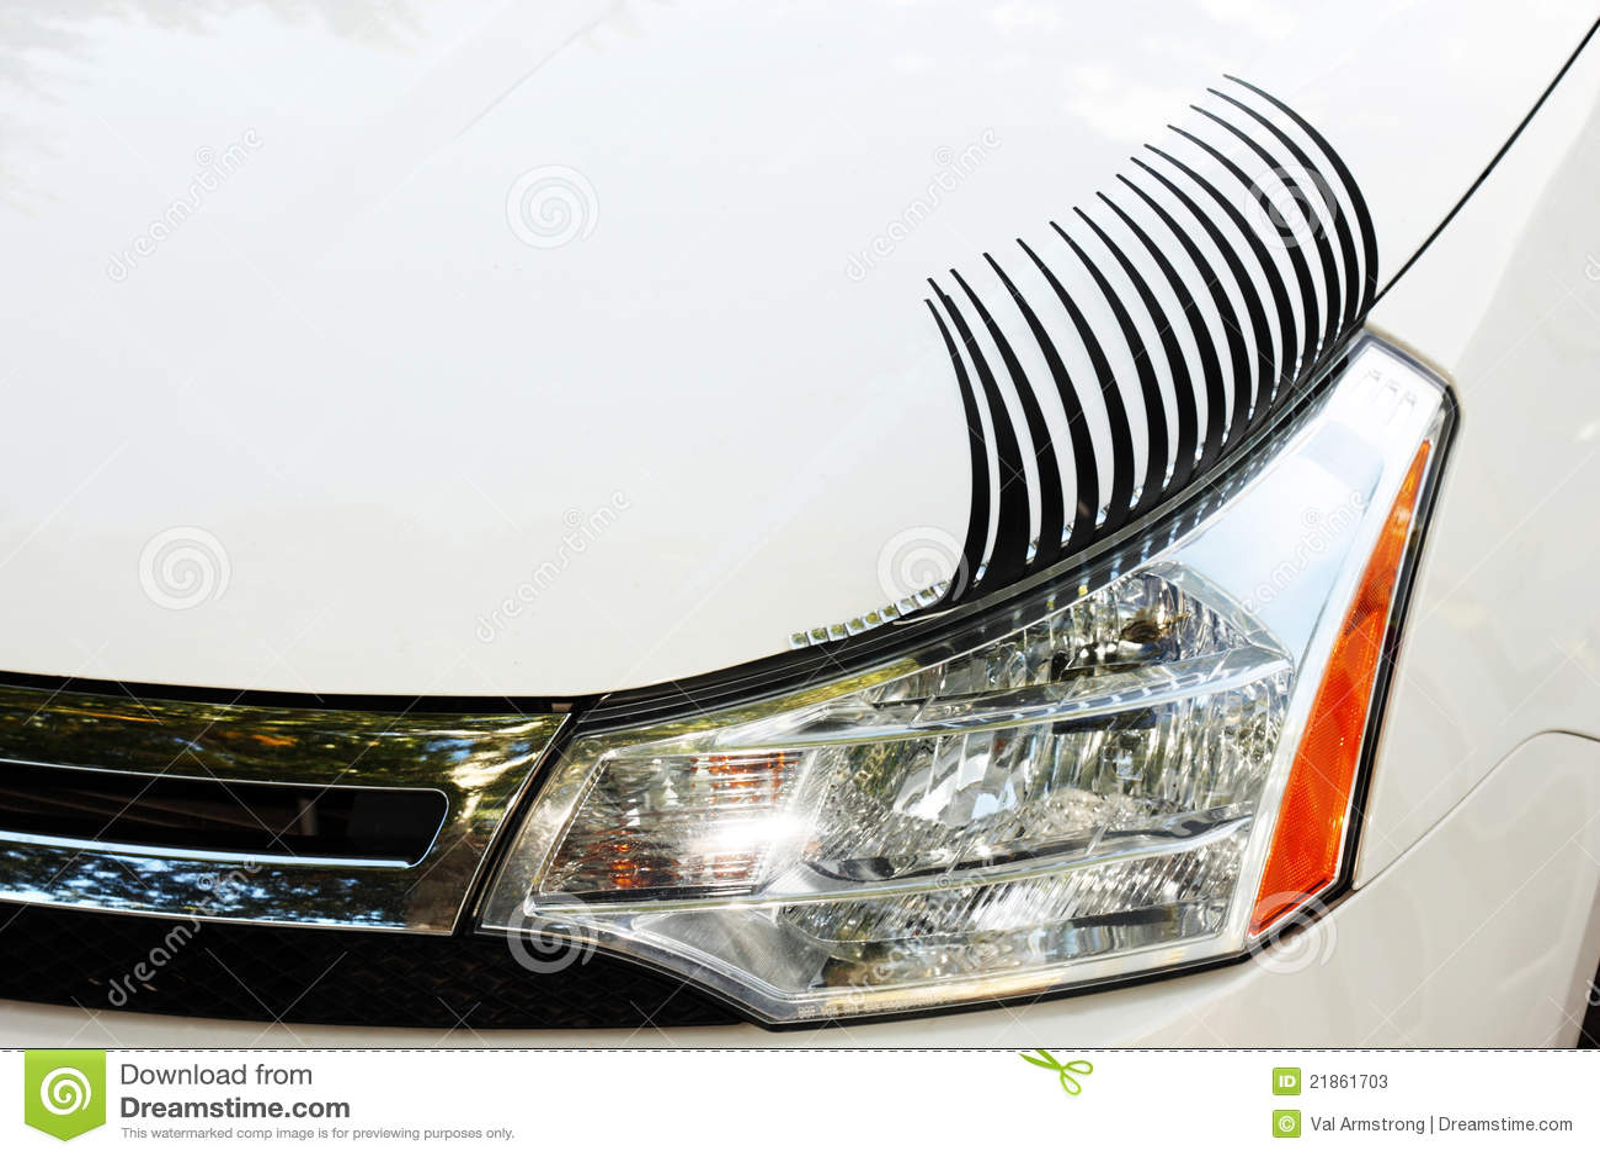 Car Eyelashes Stock Images Download 148 Photos